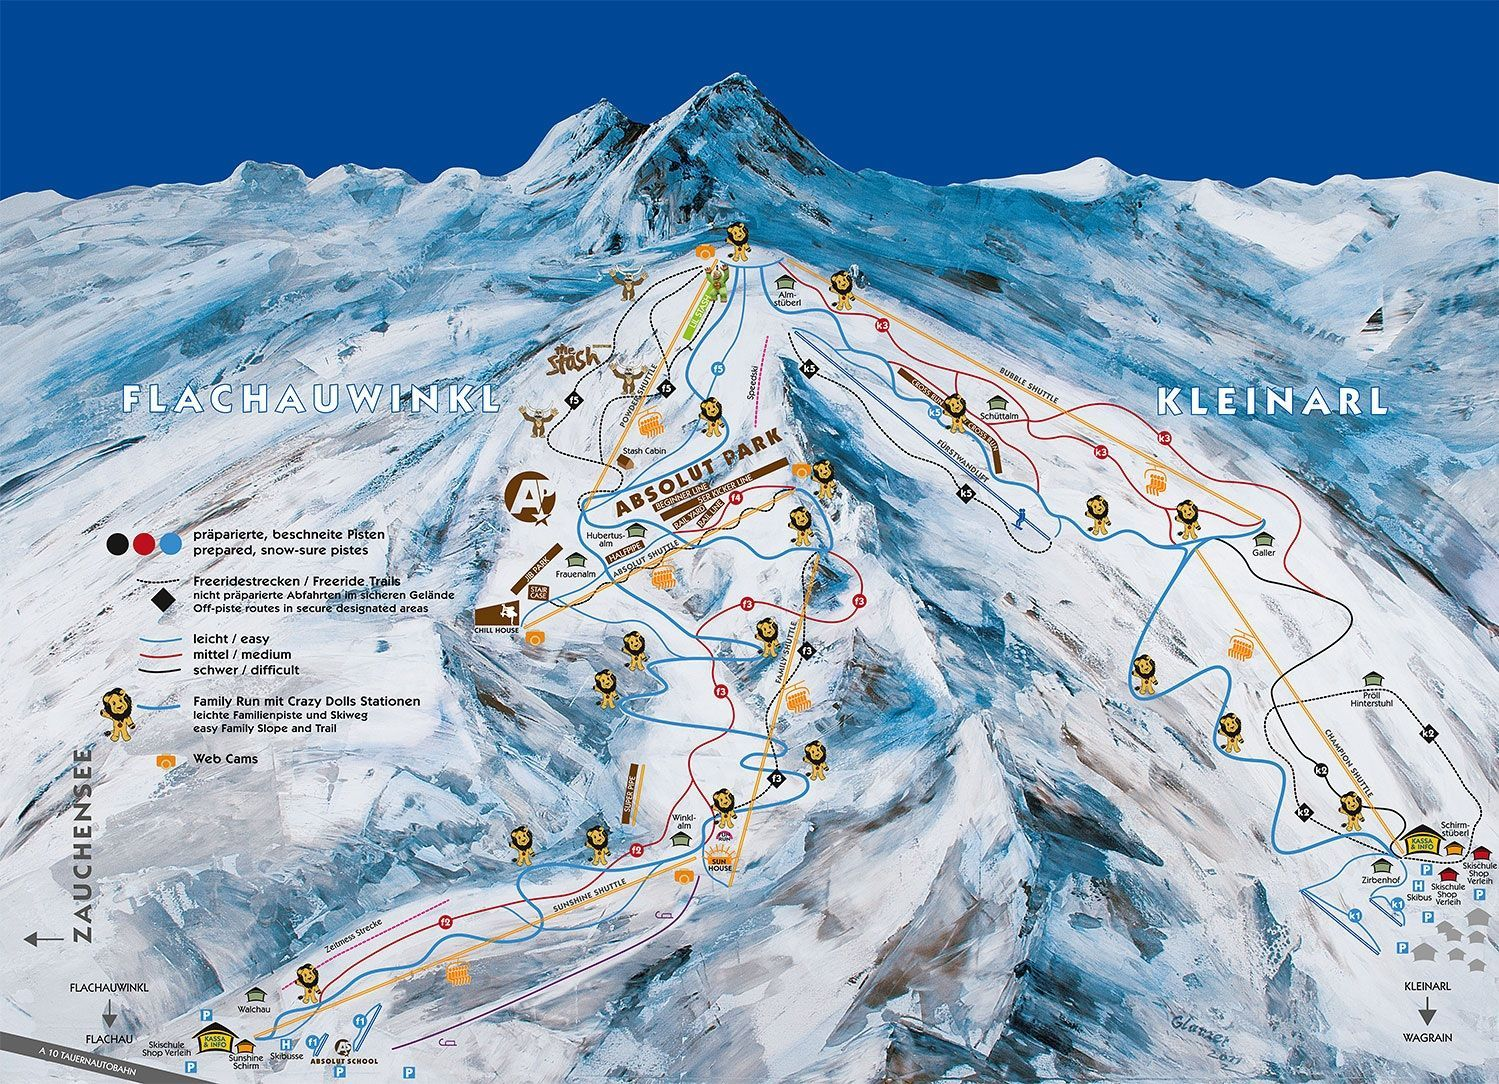 Shuttleberg Flachauwinkl/Kleinarl - ski amade Flachau